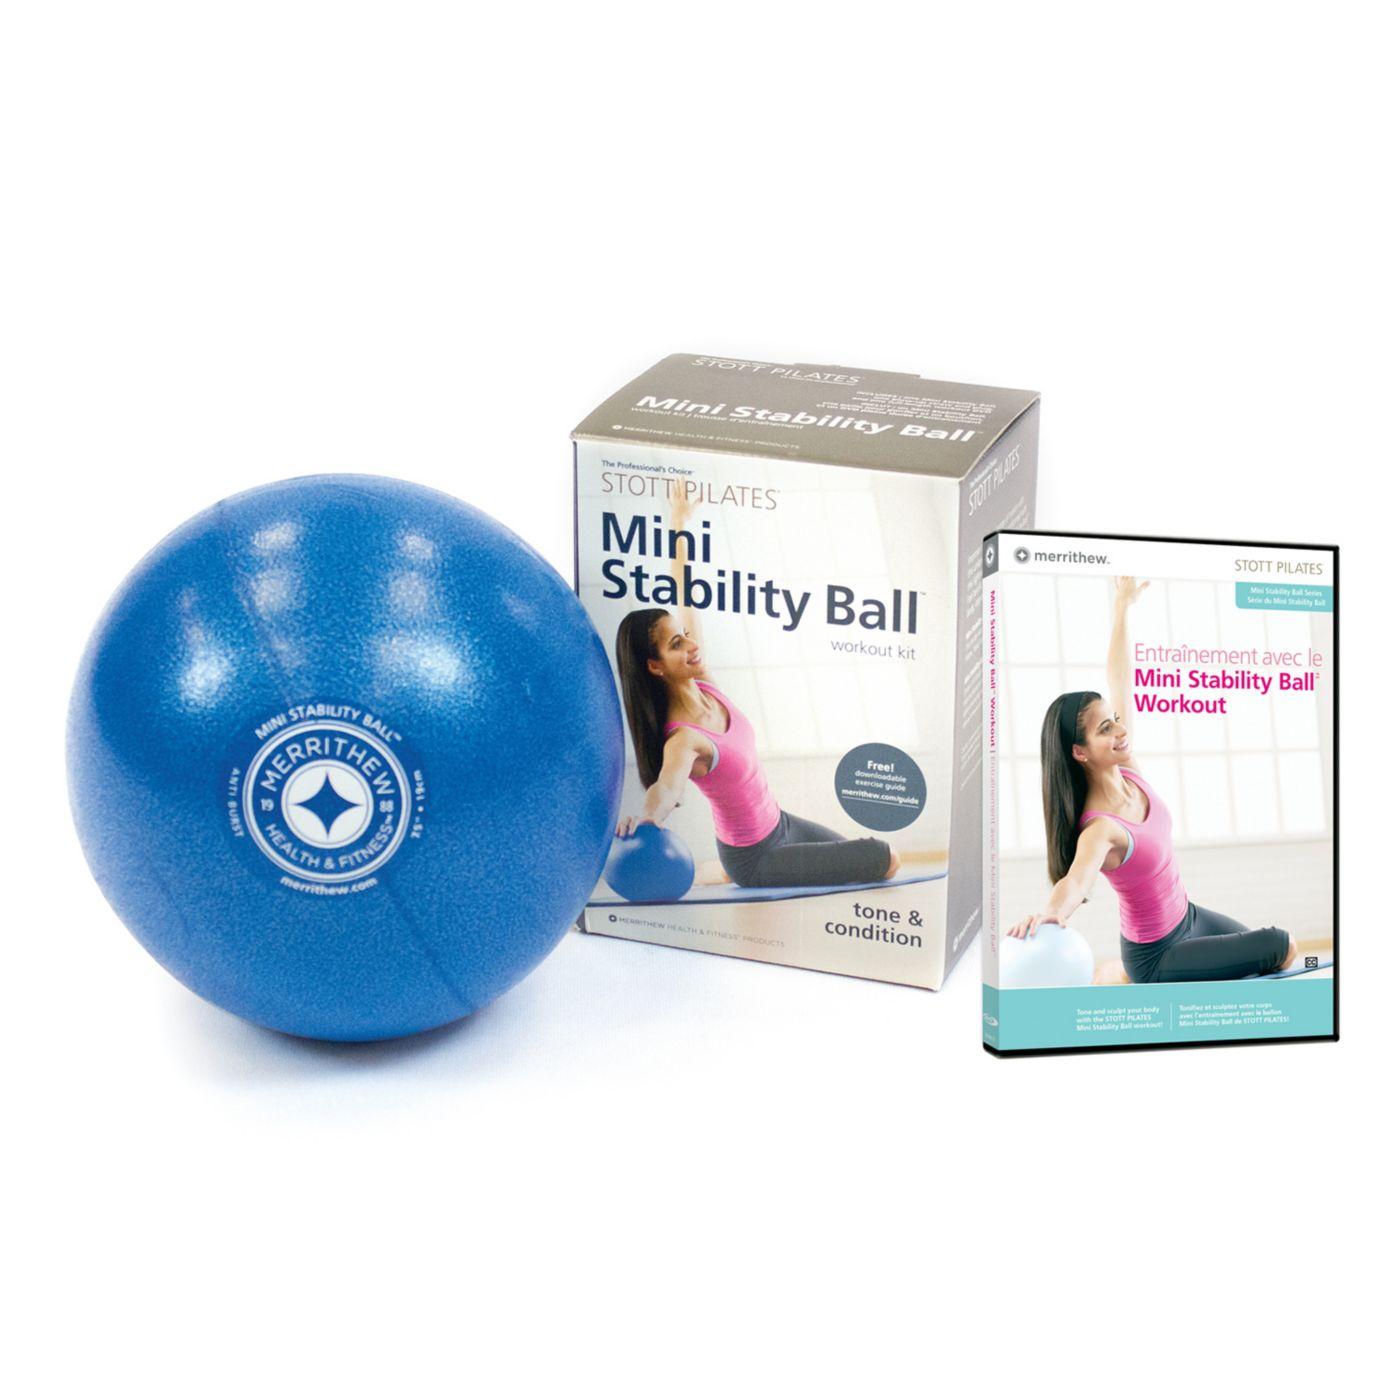 STOTT Pilates 18 cm Mini Stability Ball w/ DVD Kit